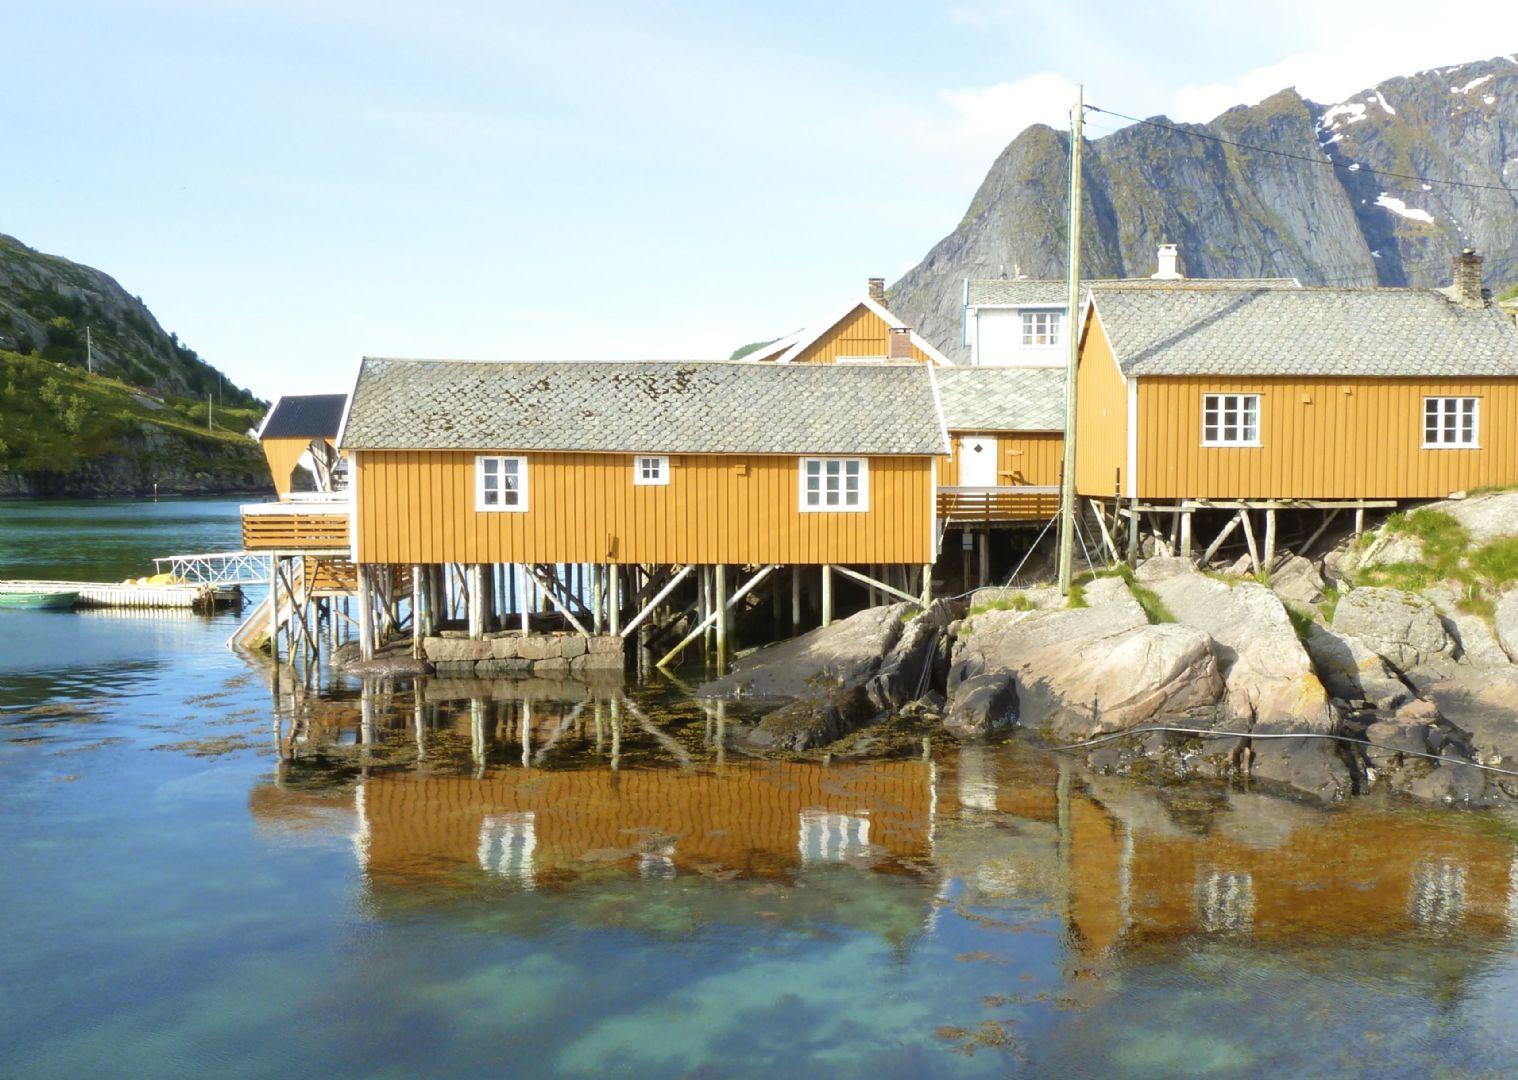 _Customer.103820.17298.jpg - Norway - Lofoten Islands - Self-Guided Leisure Cycling Holiday - Leisure Cycling